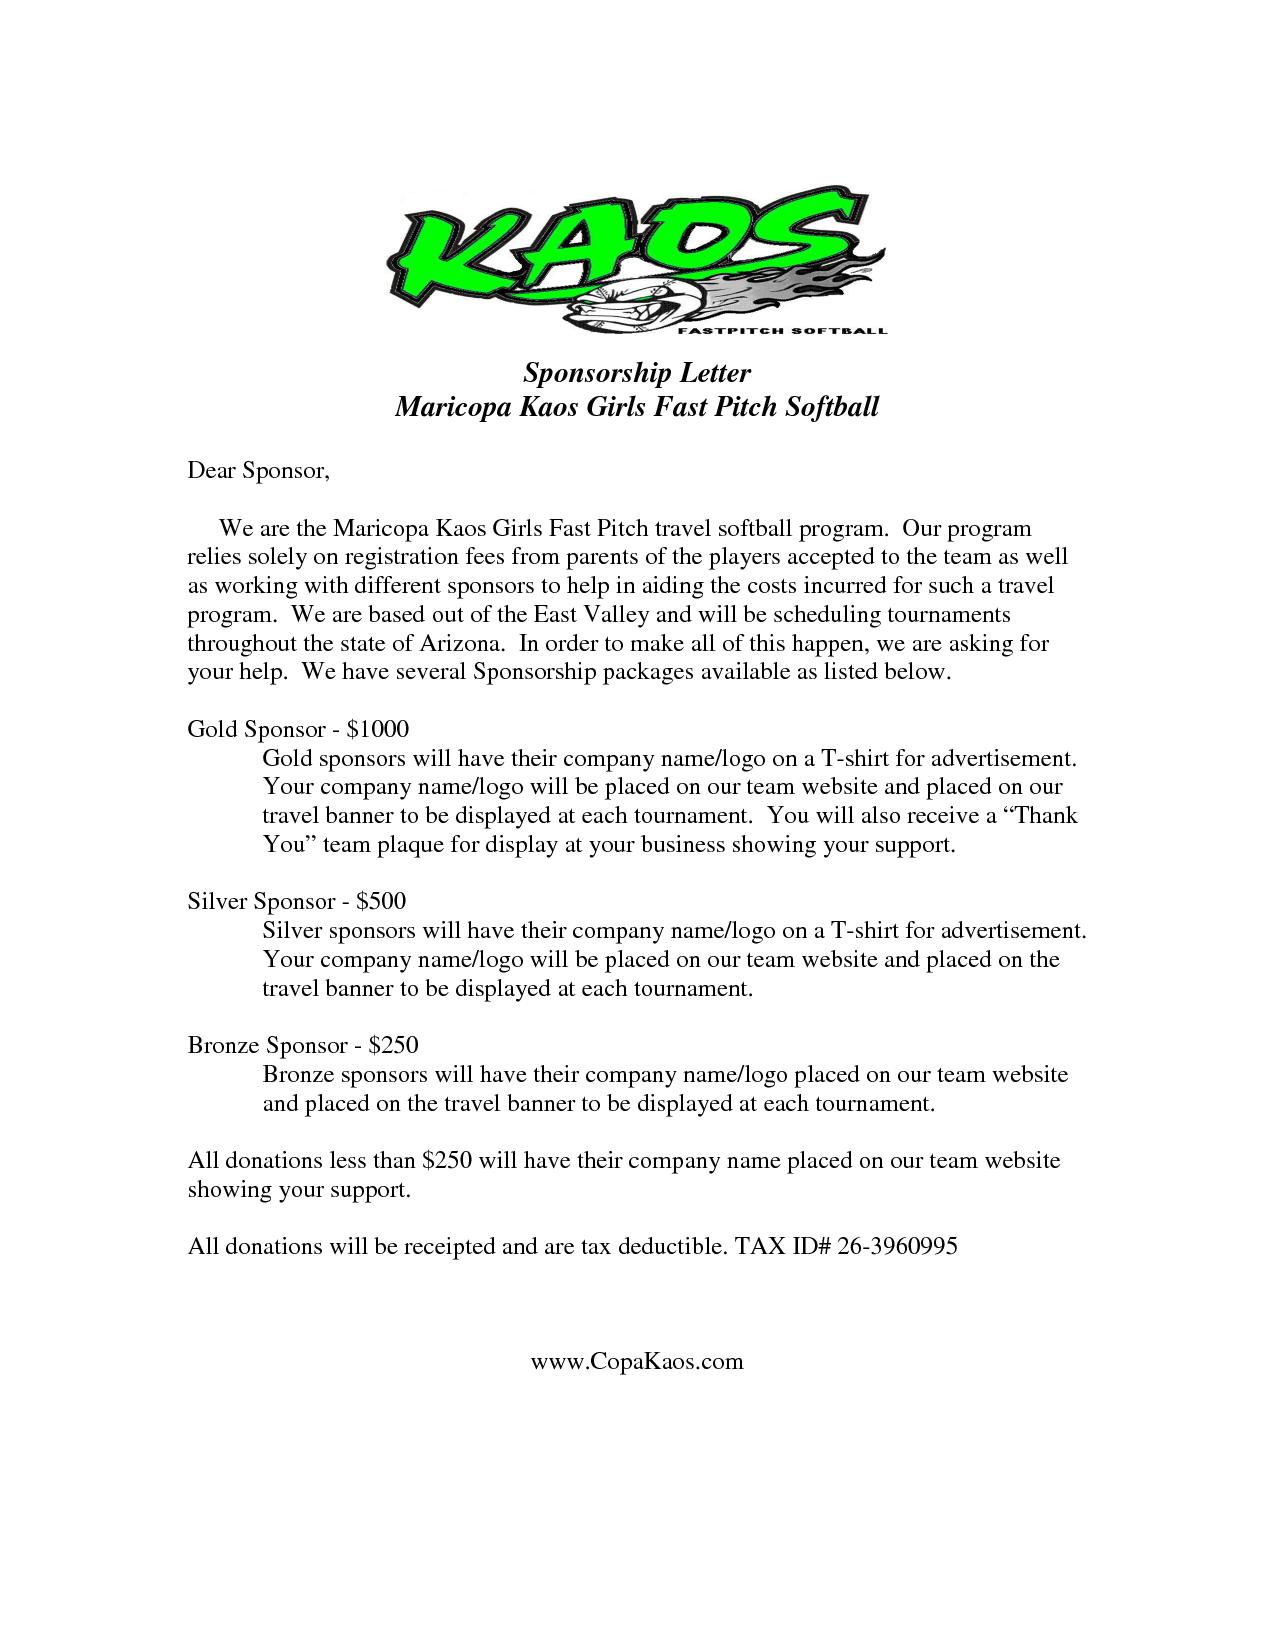 School Sponsorship Letter Template - Image Result for Sample Sponsor Request Letter Donation